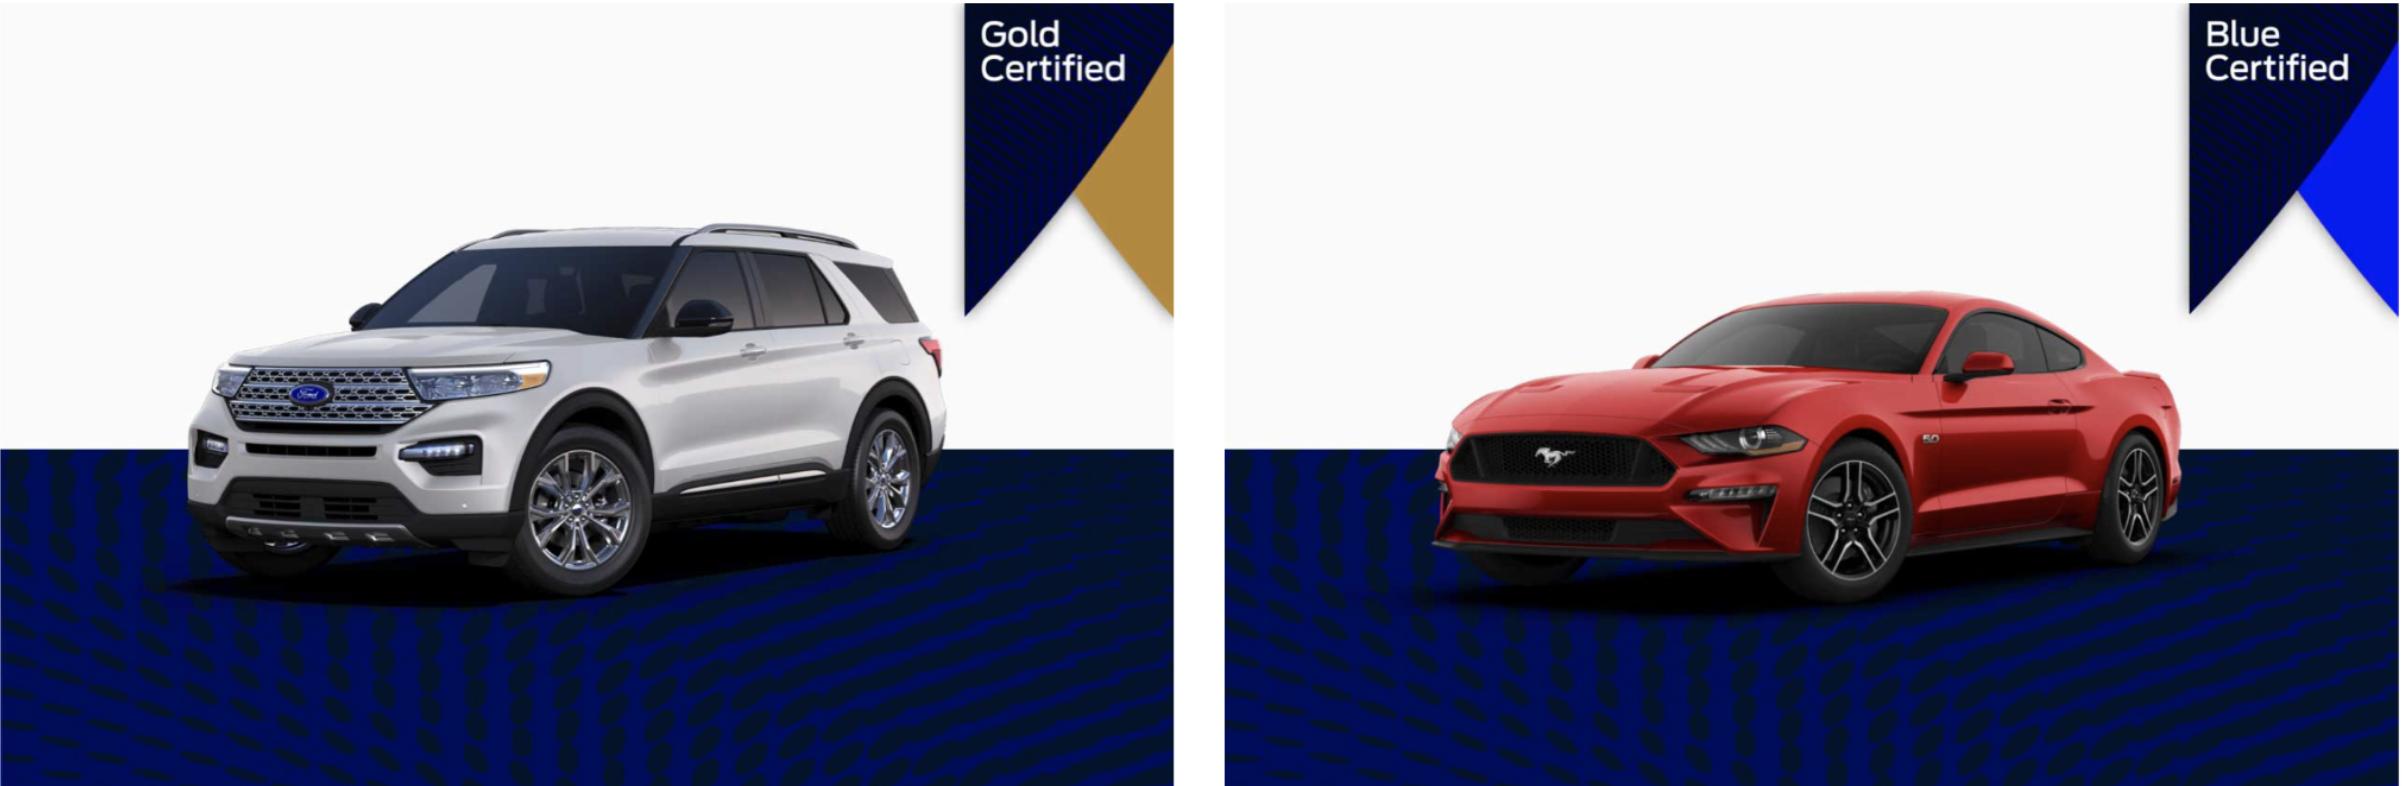 ziems blue advantage program for used cars